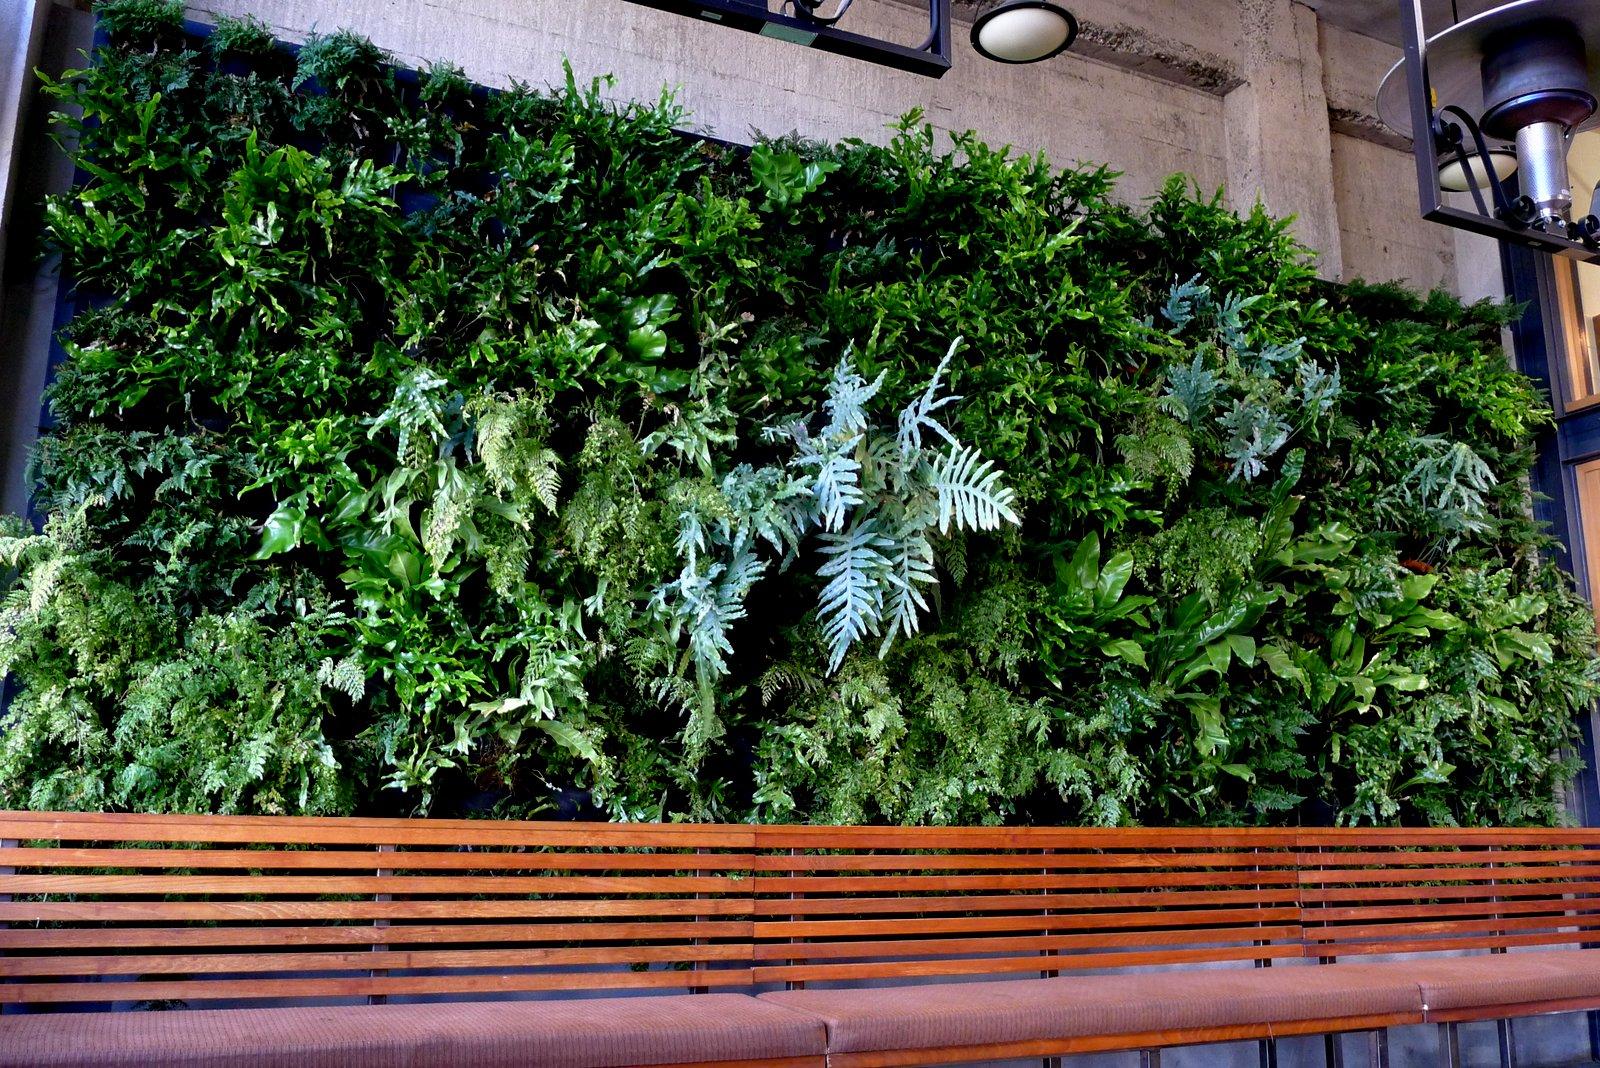 Urban wall gardening - Plantsonwalls Revisits Its Year Old Vertical Garden Fern Wall Installation For Urban Bistro In Burlingame